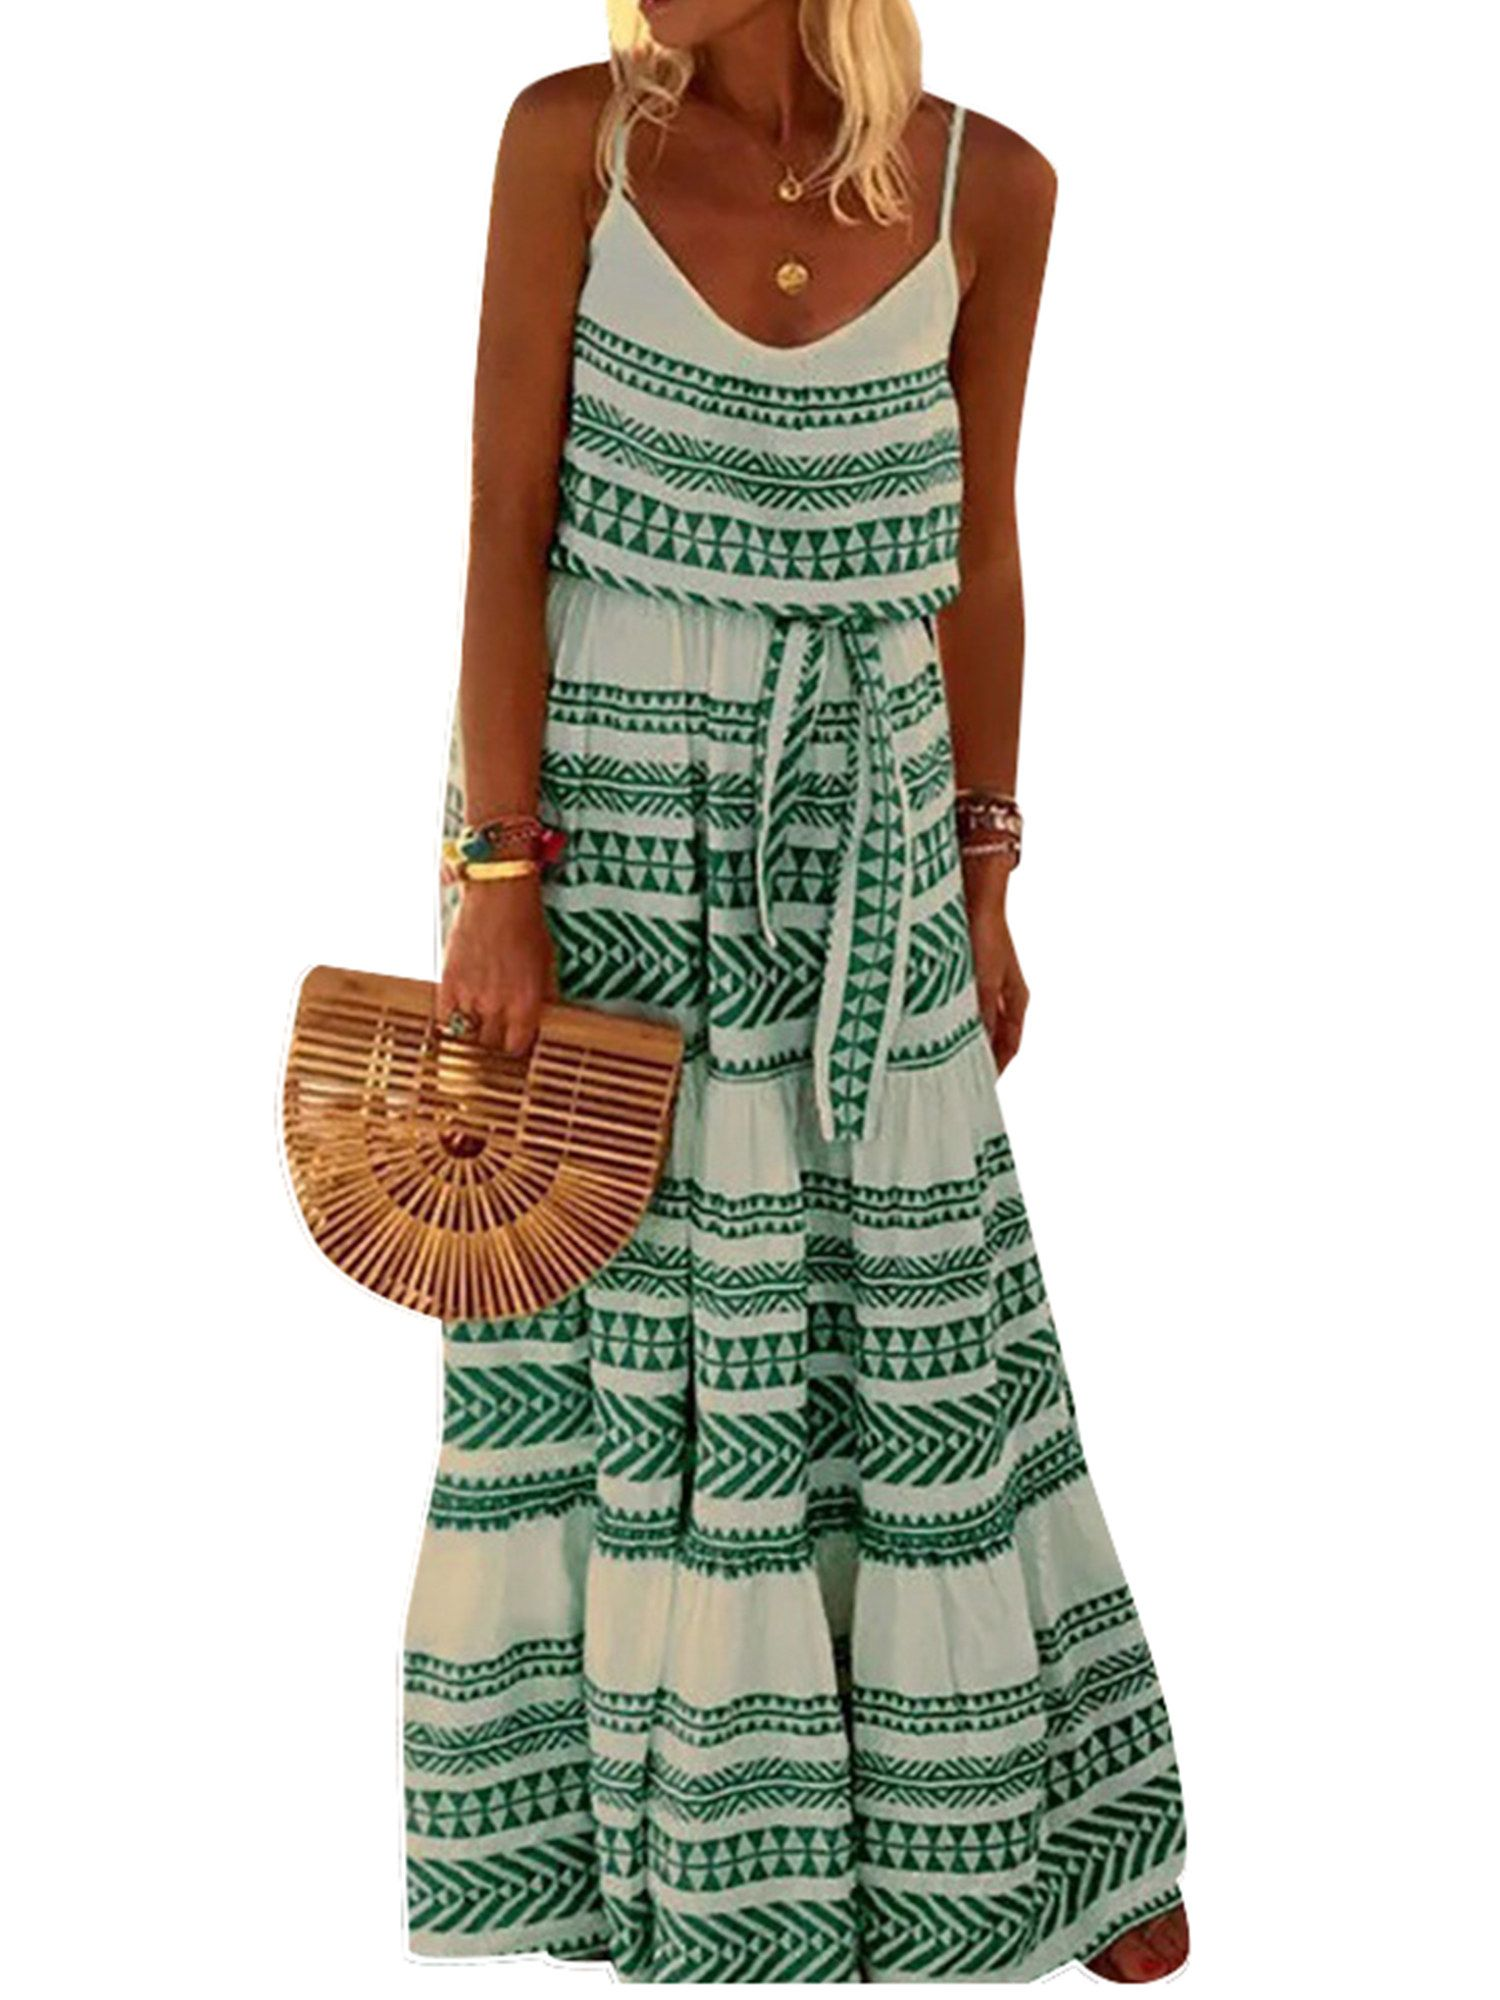 25 Boho Dresses From Walmart With Major Summer Weekend Vibes Boho Summer Dresses Boho Dress Cheap Summer Dresses [ 2000 x 1500 Pixel ]